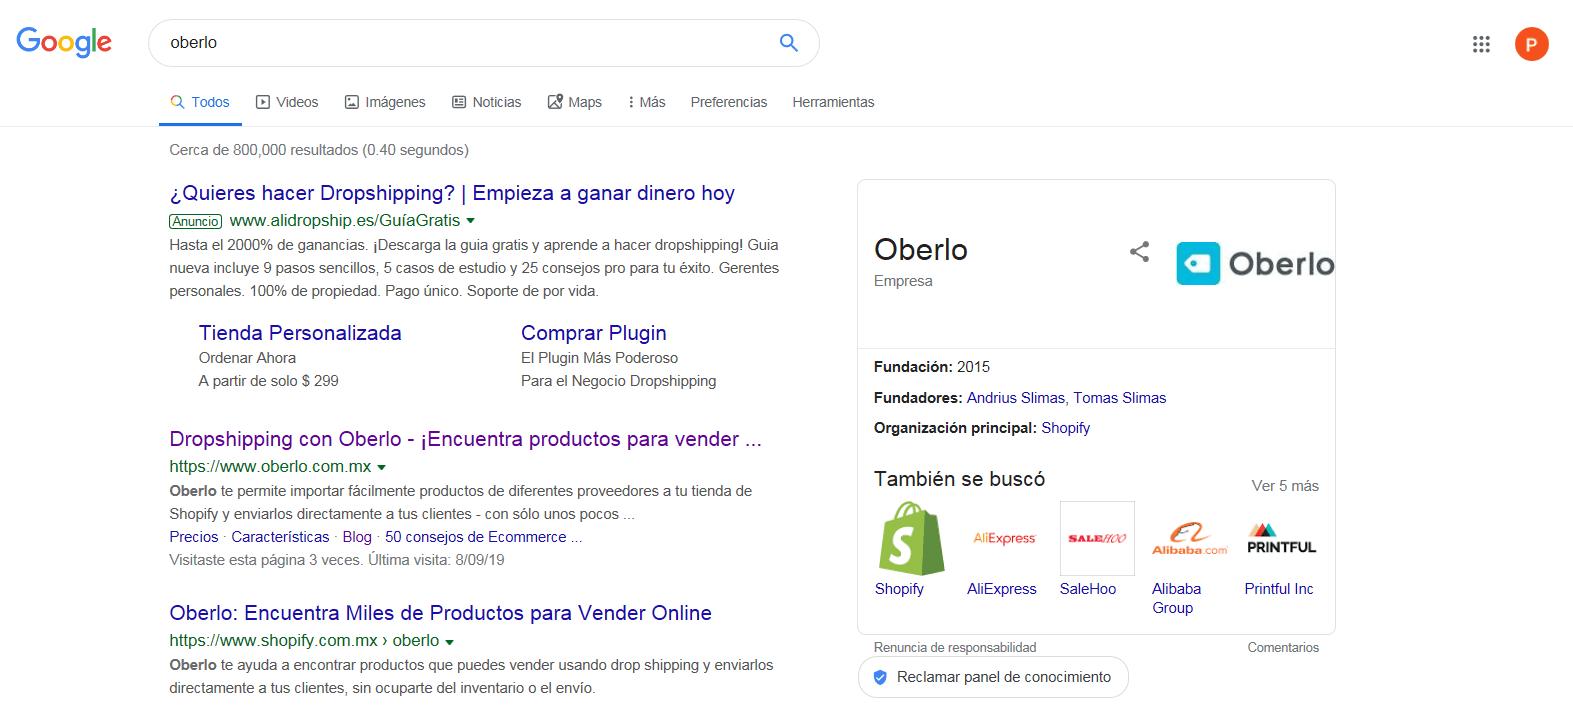 1. ejemplo de un SERP de Google